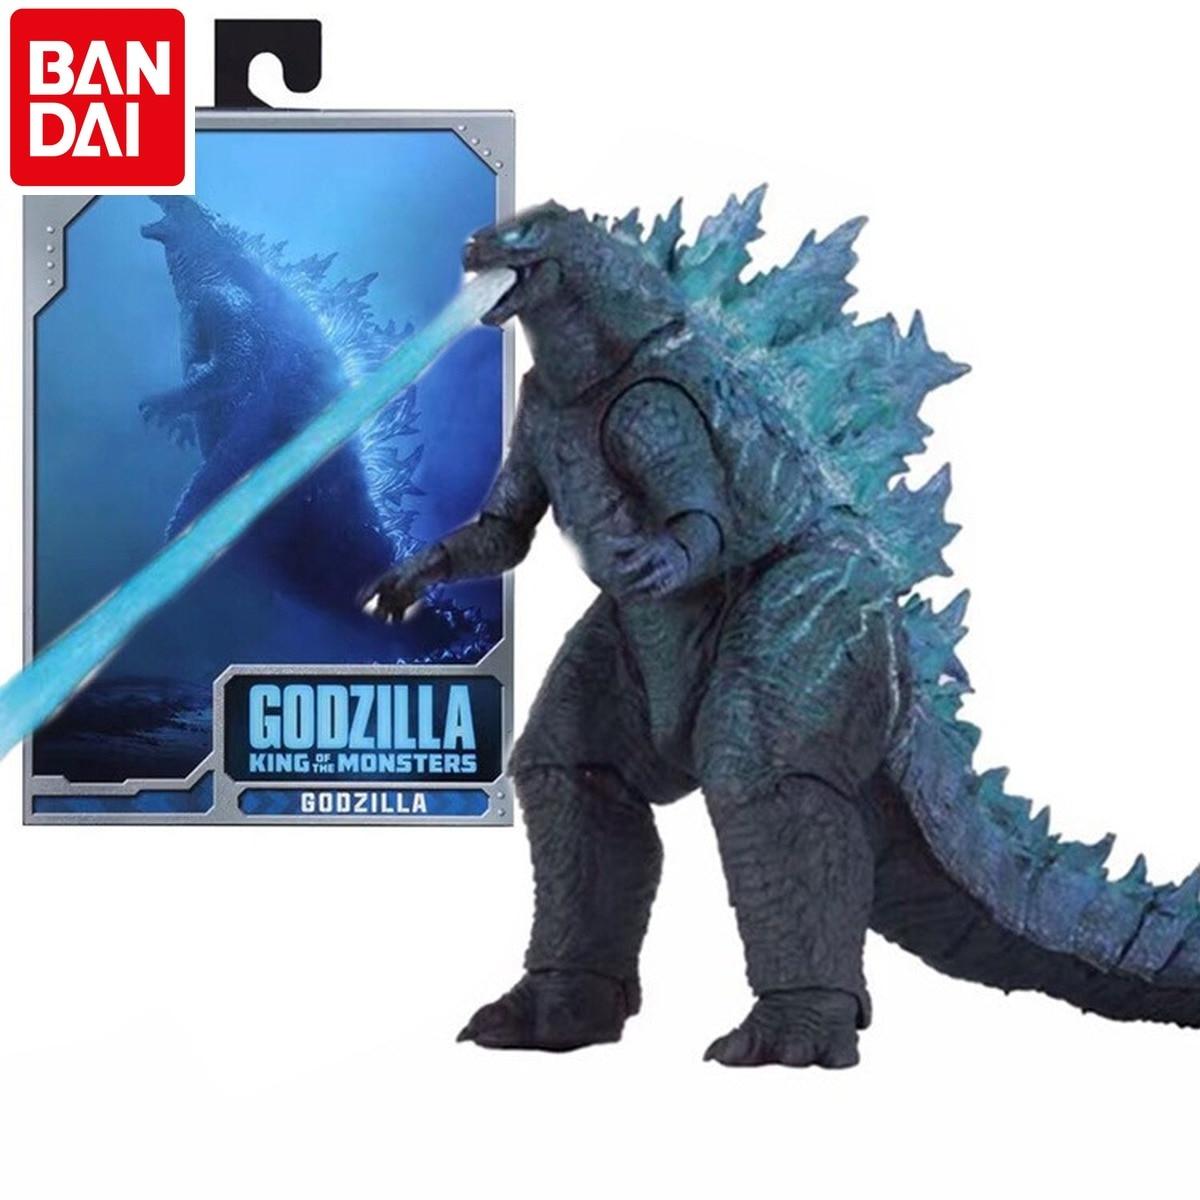 BANDAI Godzilla 2019 Movie Nuclear Power Injection Energy Version SHM Godzilla Monster Mobile Phone Model Hand To Do